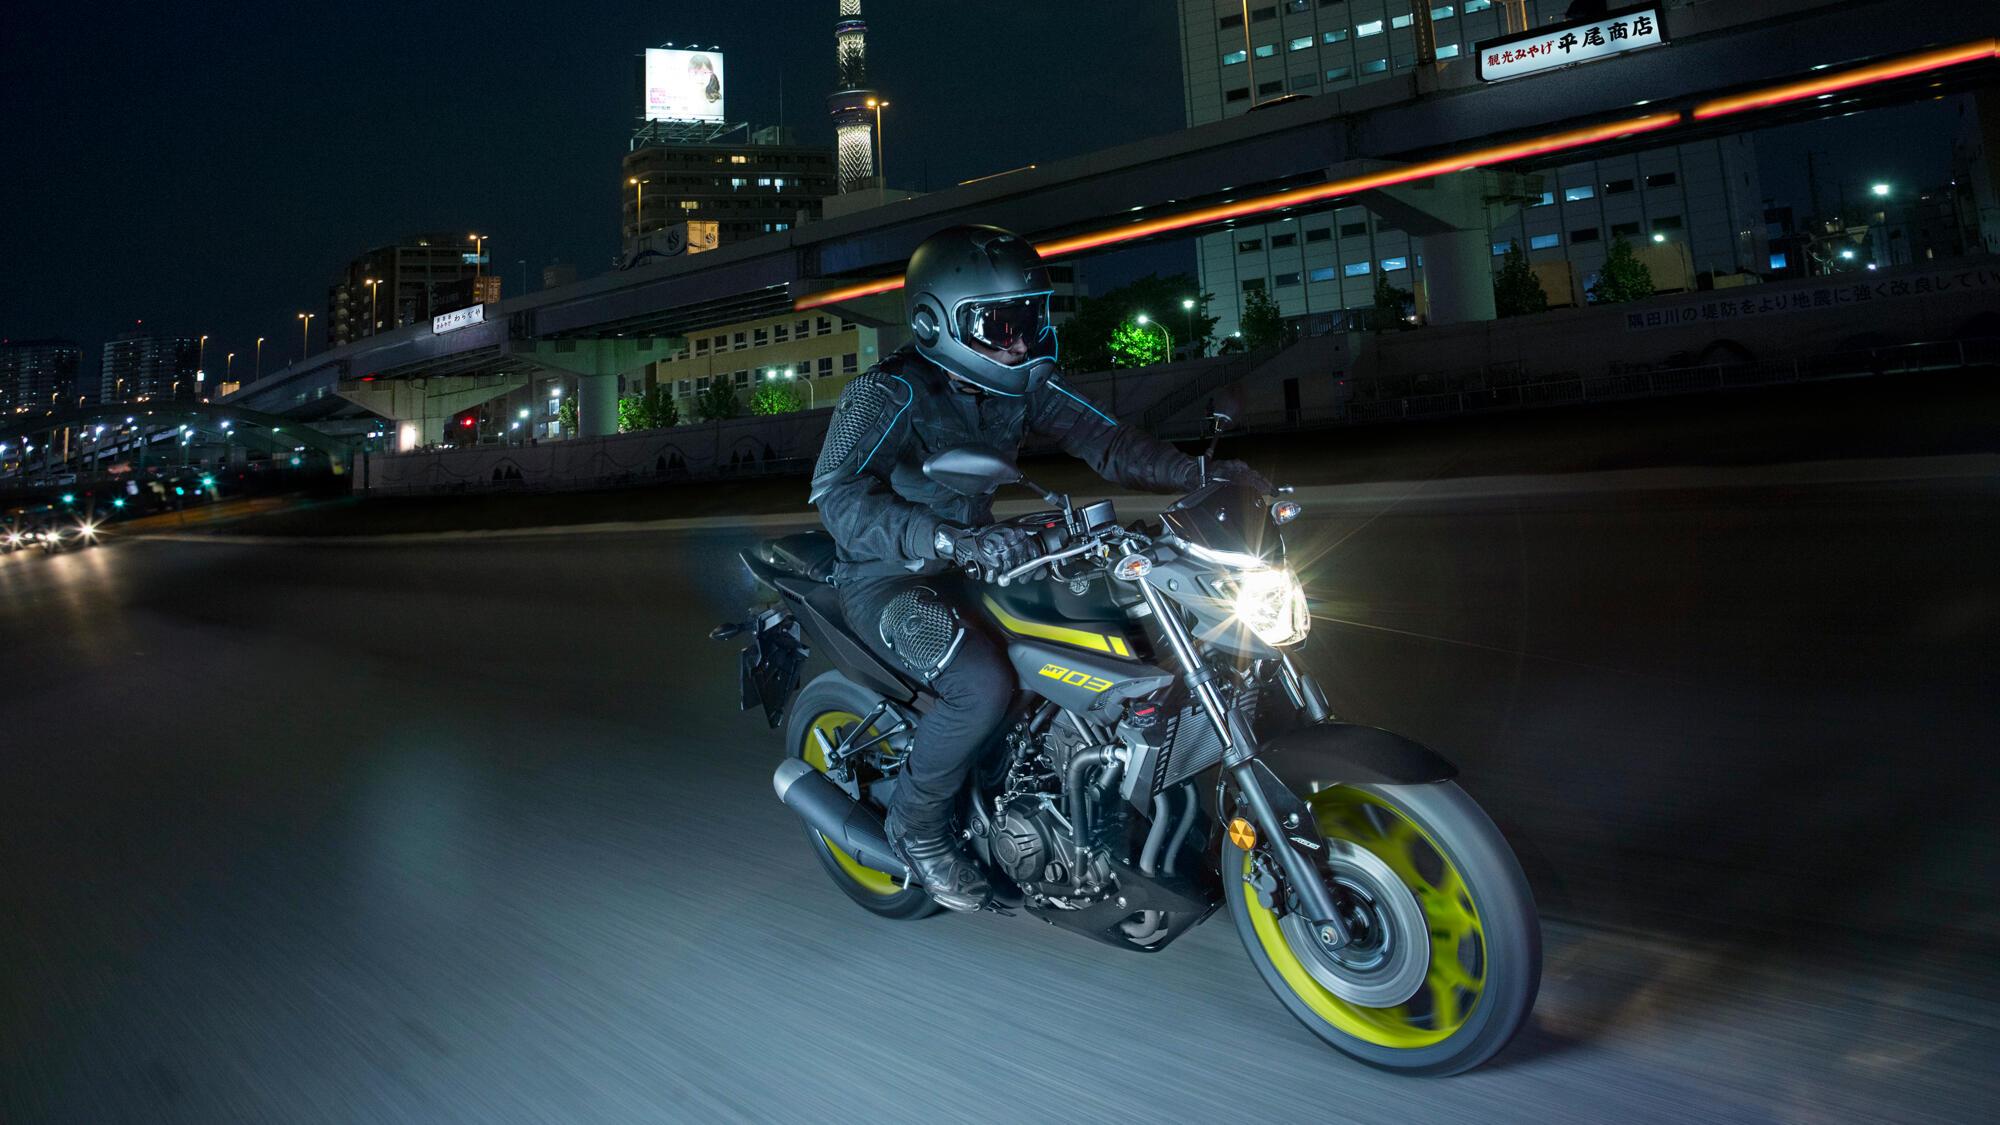 Mt 03 Motorcycles Yamaha Motor